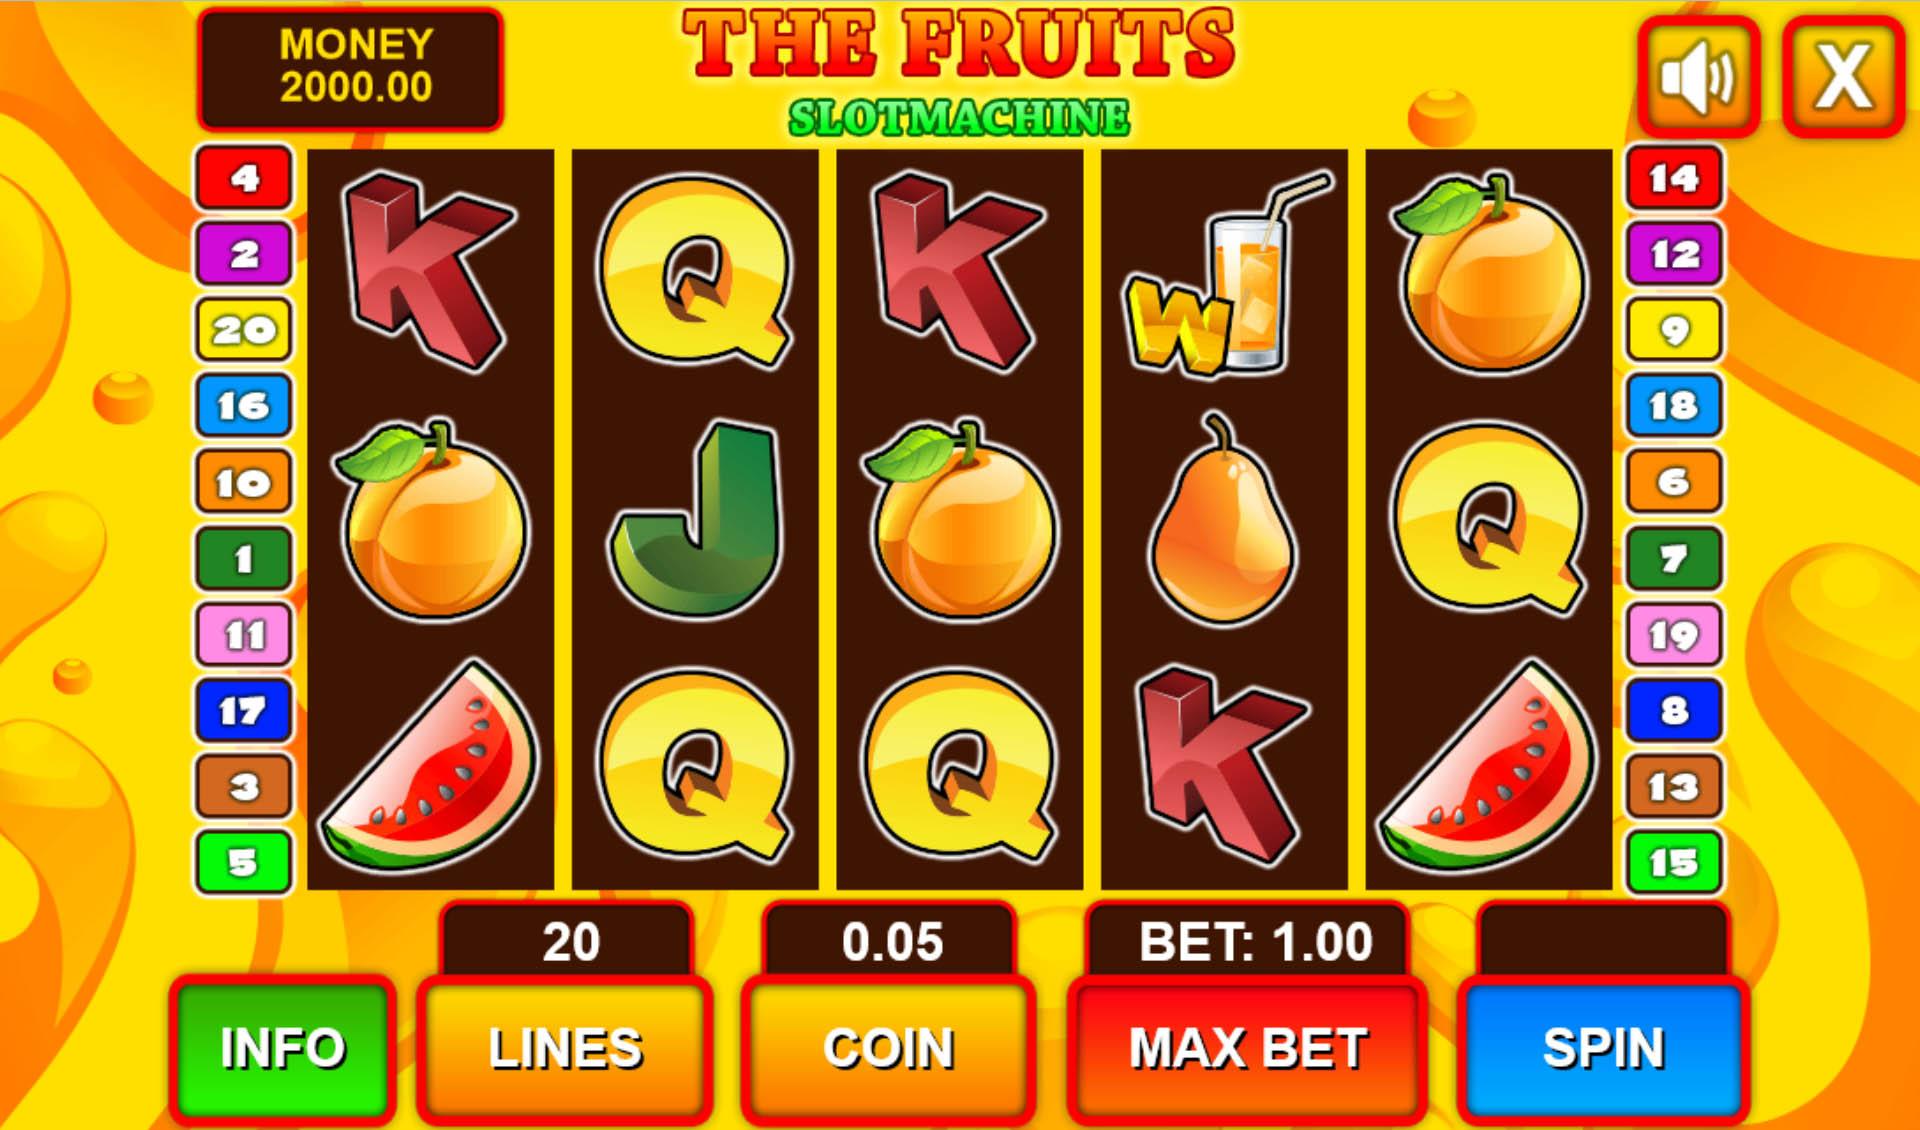 Free Slots Games at Slotomania.com - Casino Slot Machines for Everyone